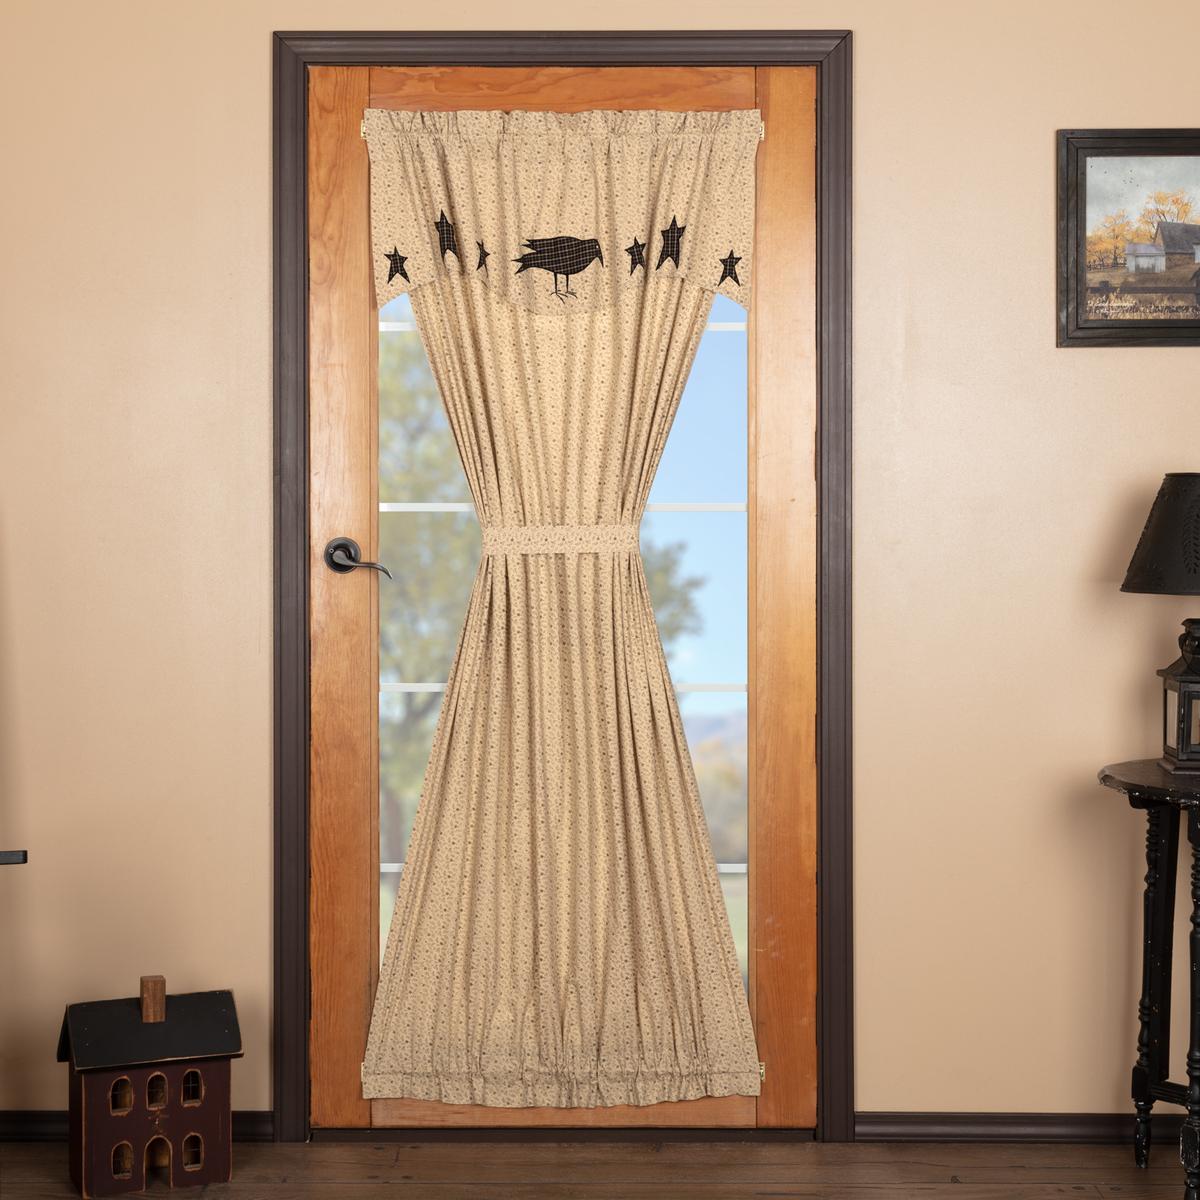 Https Www Bonanza Com Listings Kettle Grove Door Panel Curtain Crow Star Farmhouse Style 701537167 Fref Wp Primitive Curtains Door Panel Curtains Panel Doors